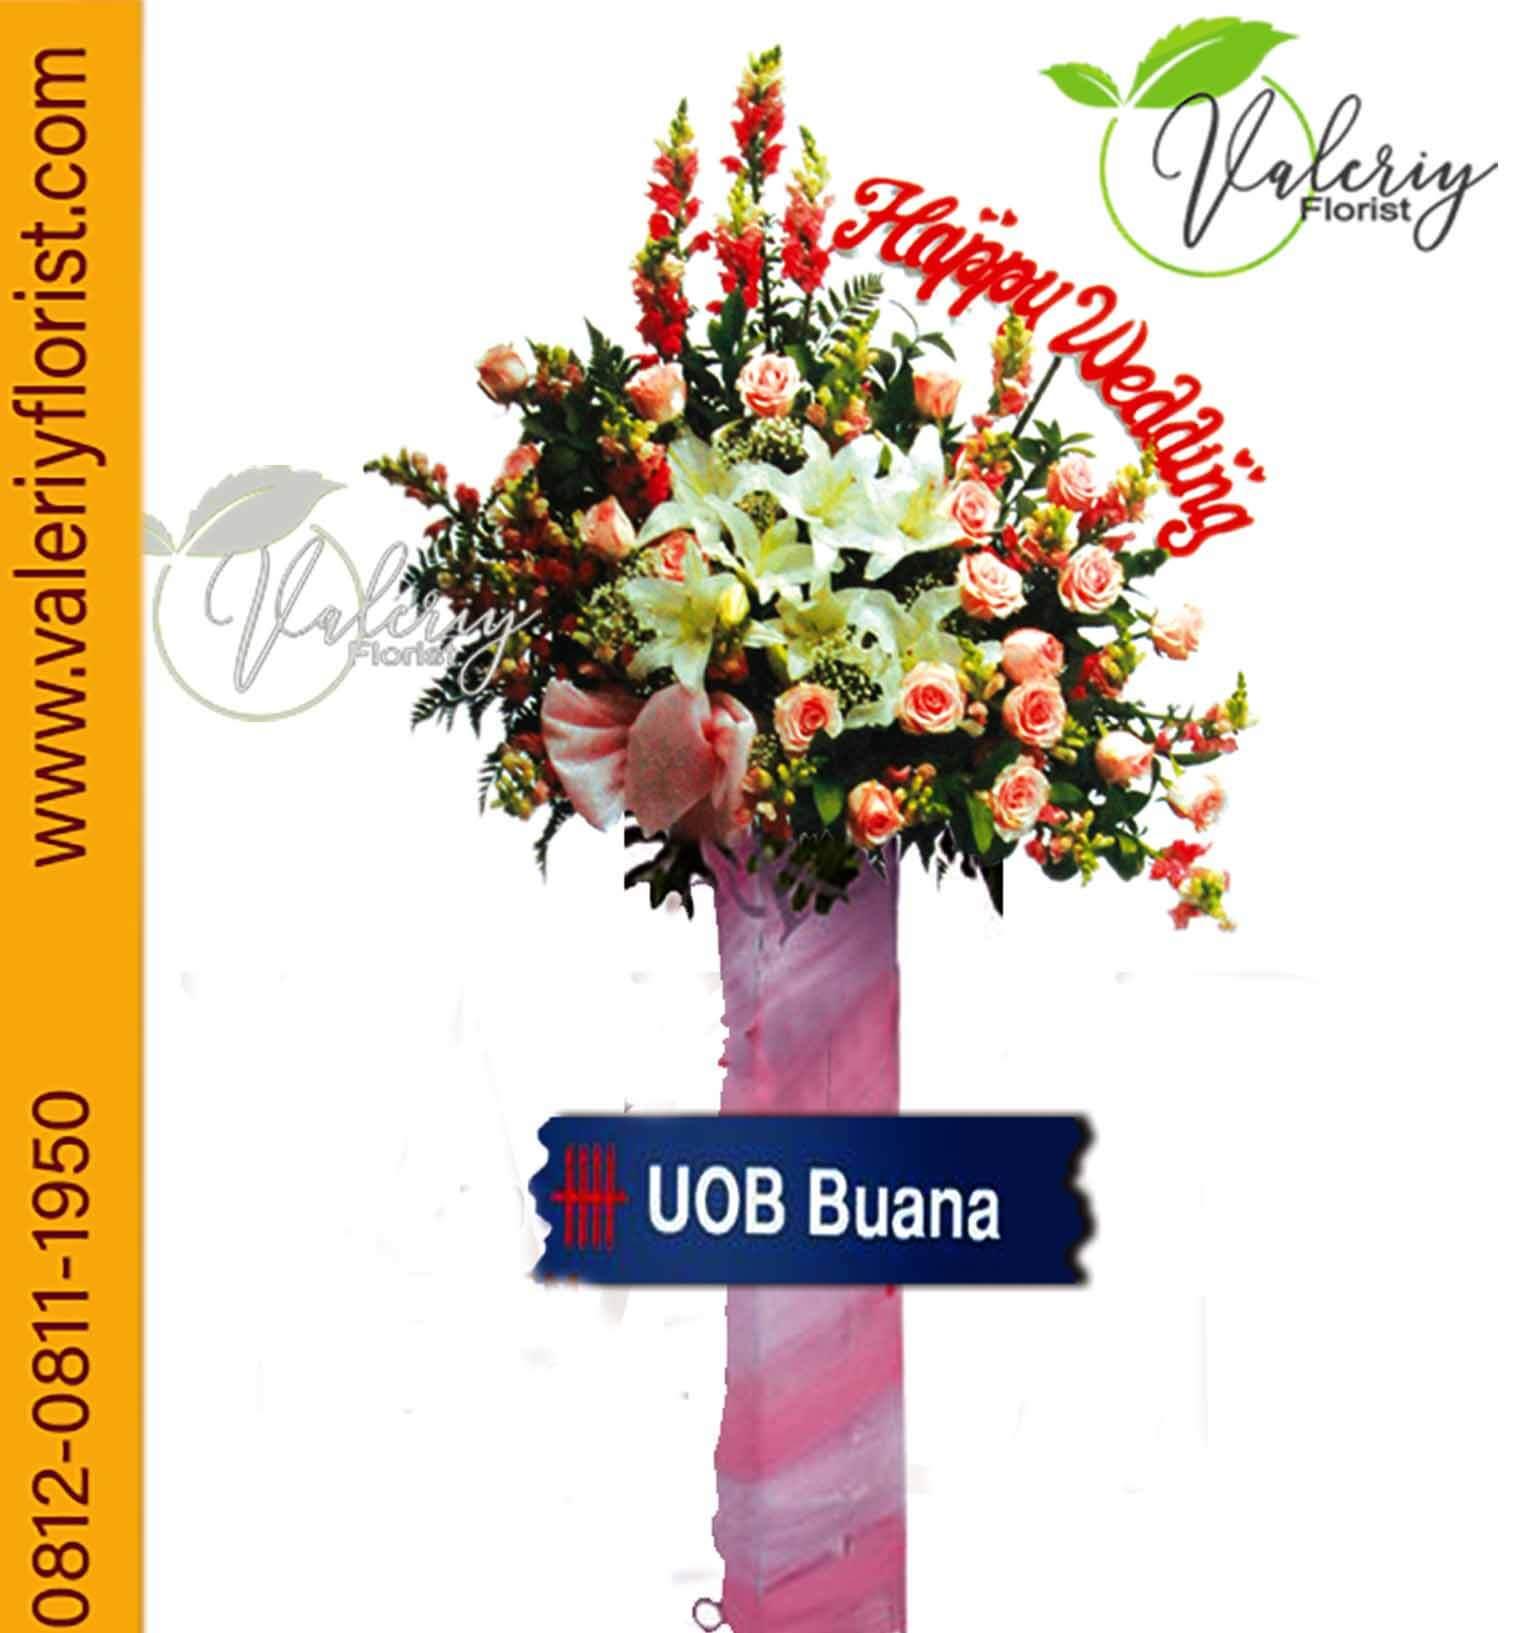 Standing Flower Dekat Toko Bunga jakarta